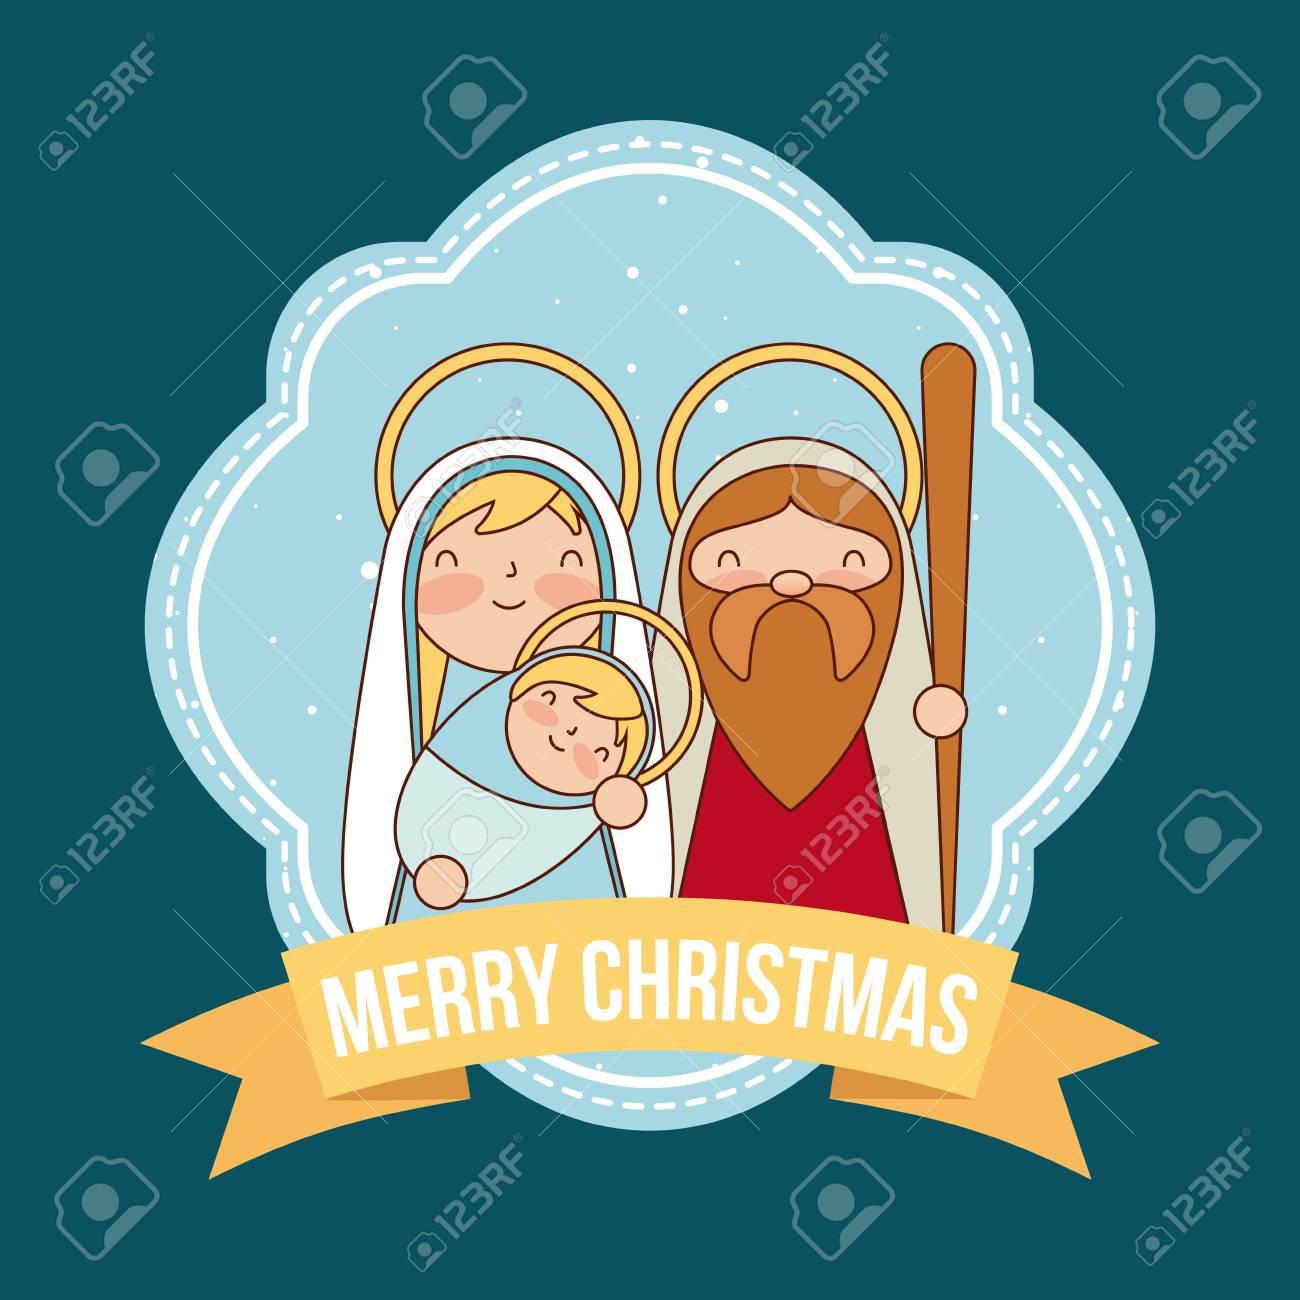 Merry Christmas Ribbon Clipart.Merry Christmas Ribbon Sacred Family Holding Baby Vector Illustration